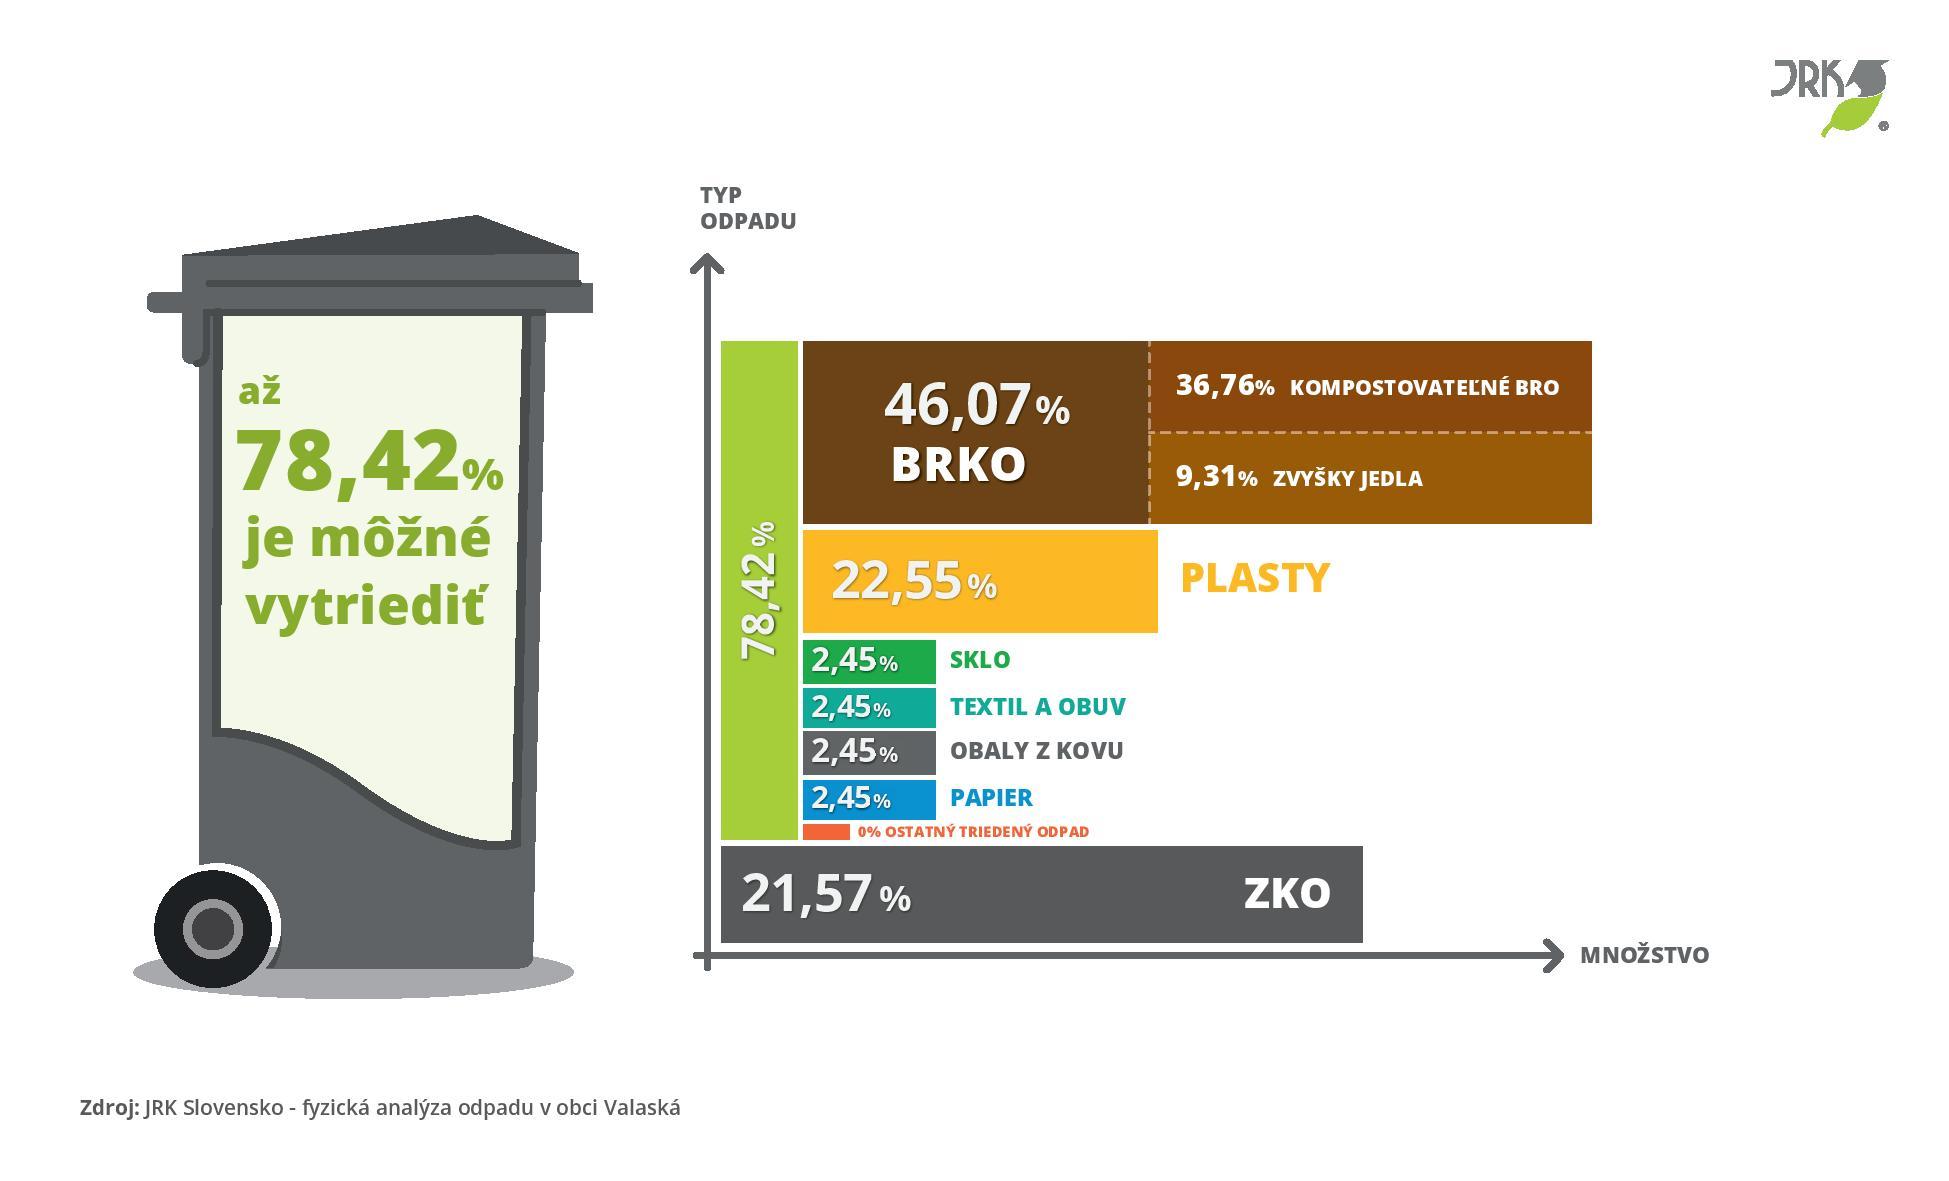 analýza odpadu, Valaská, triedenie odpadu